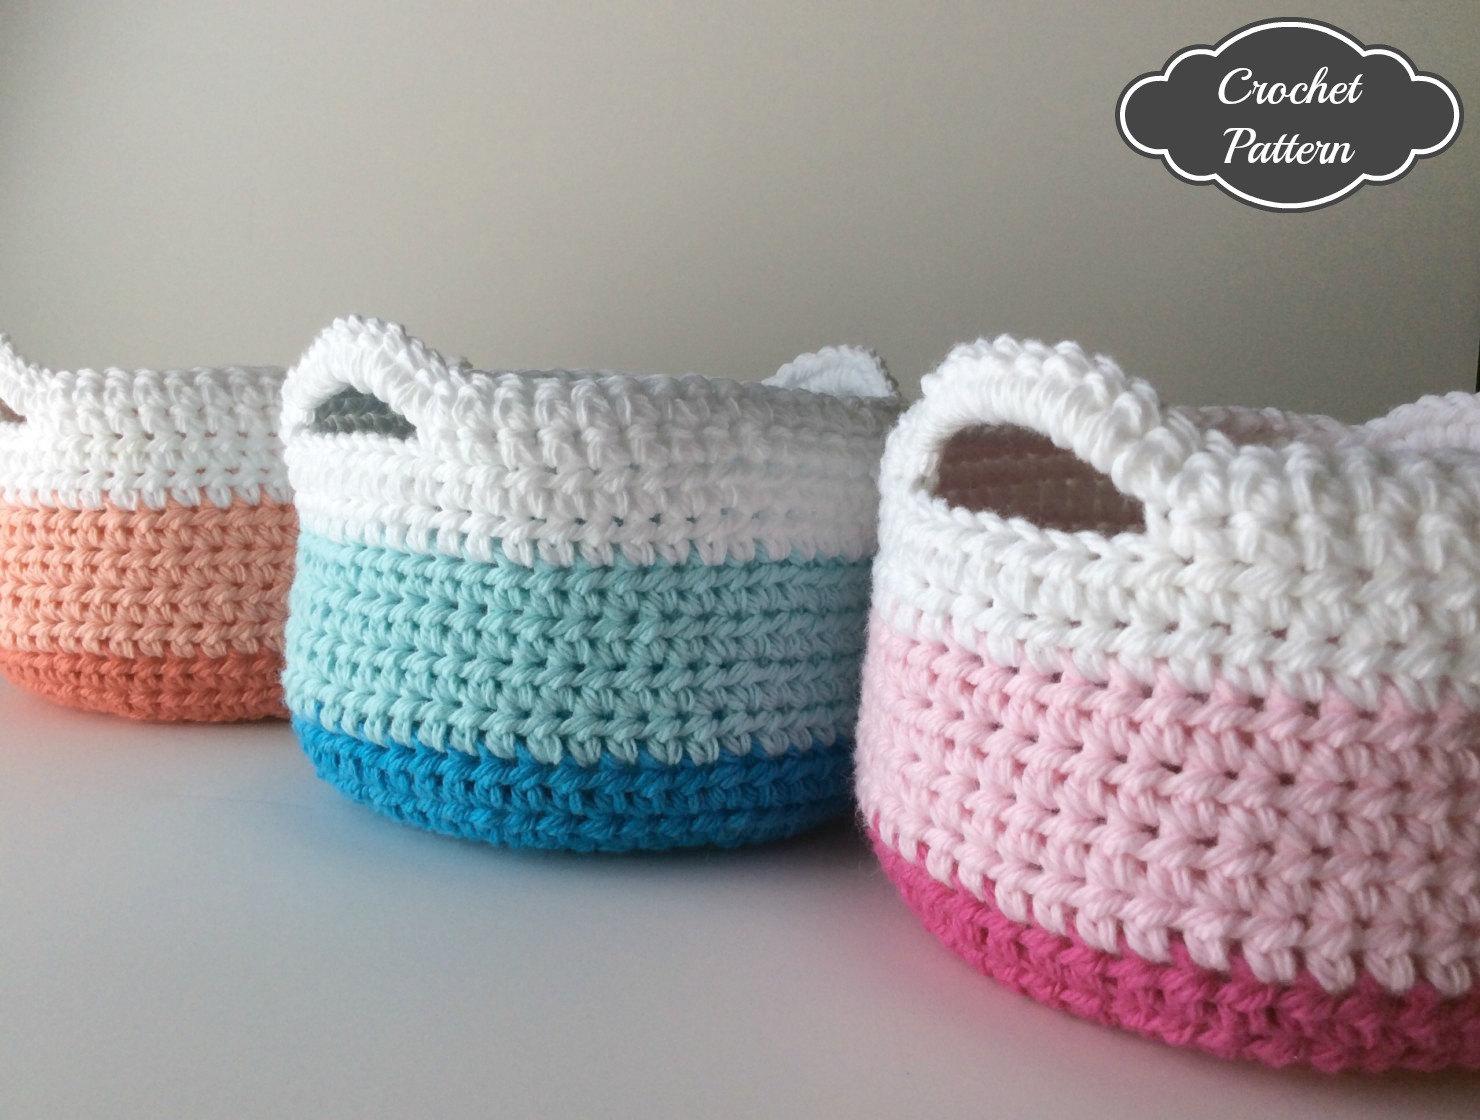 crochet basket pattern 🔎zoom vocjzdf